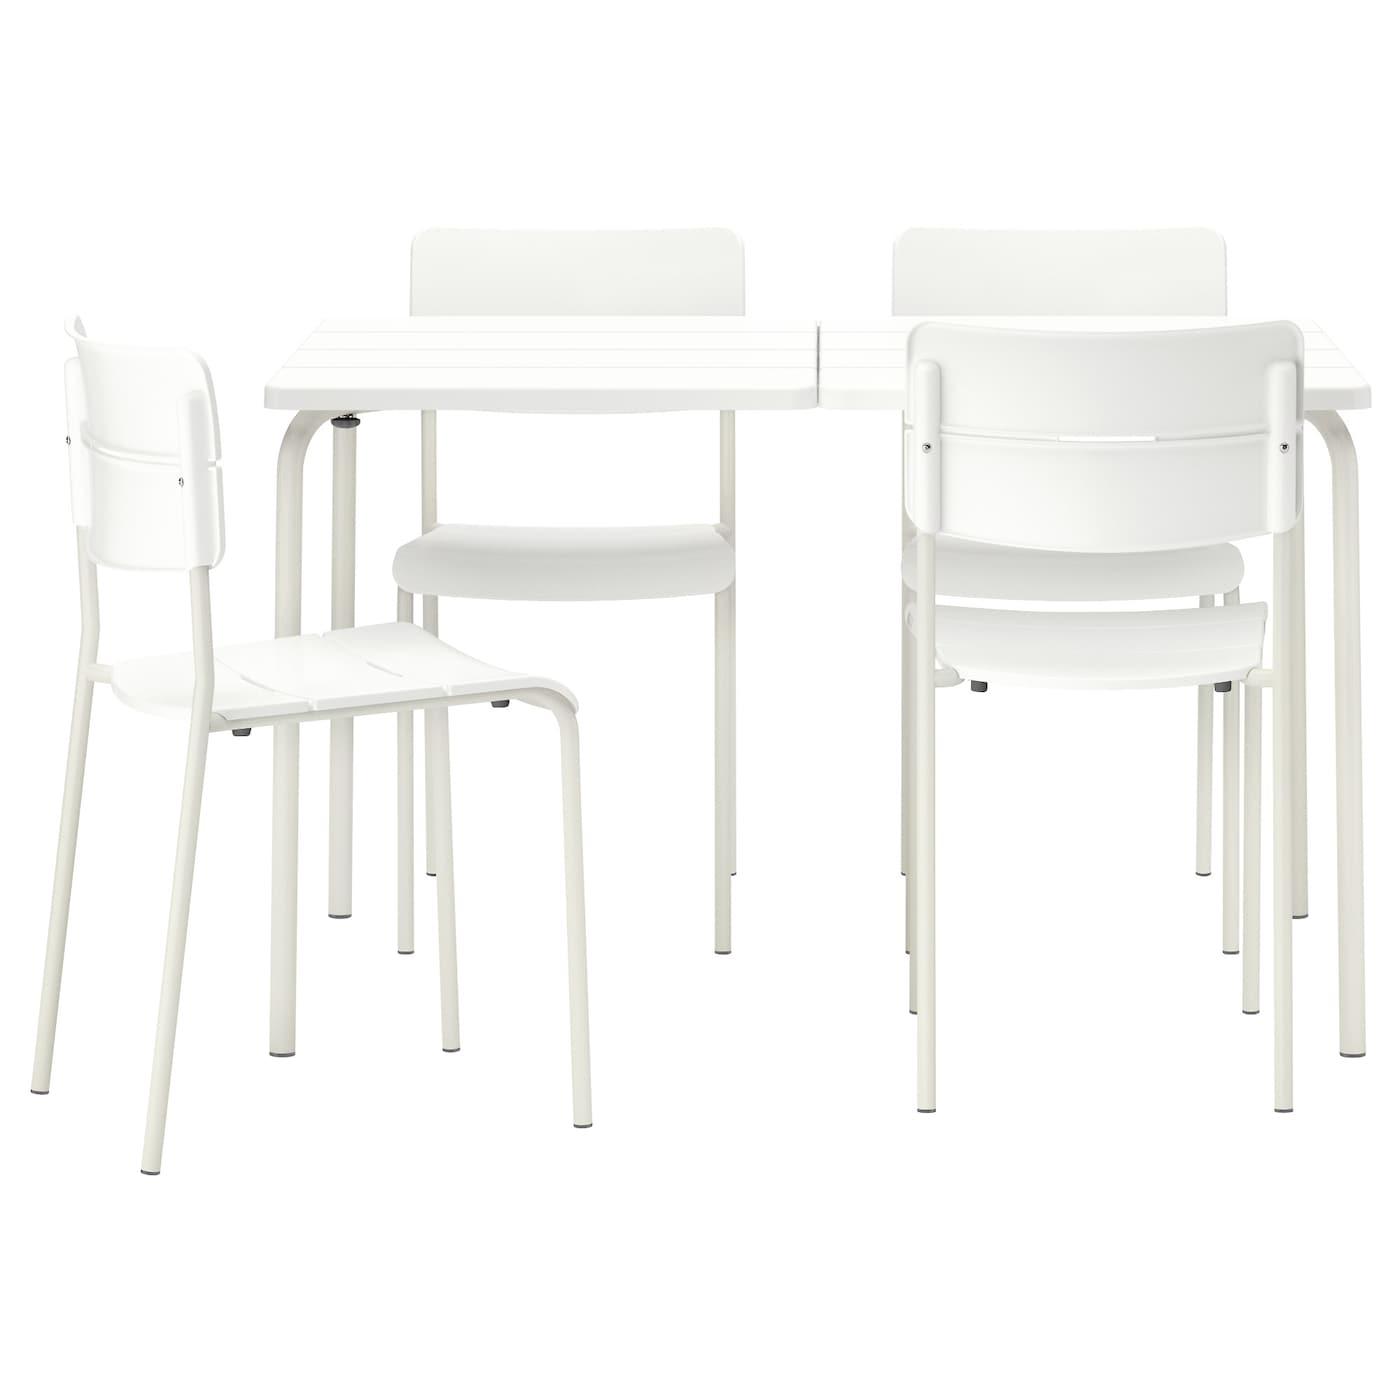 outdoor tables ikea ireland dublin. Black Bedroom Furniture Sets. Home Design Ideas